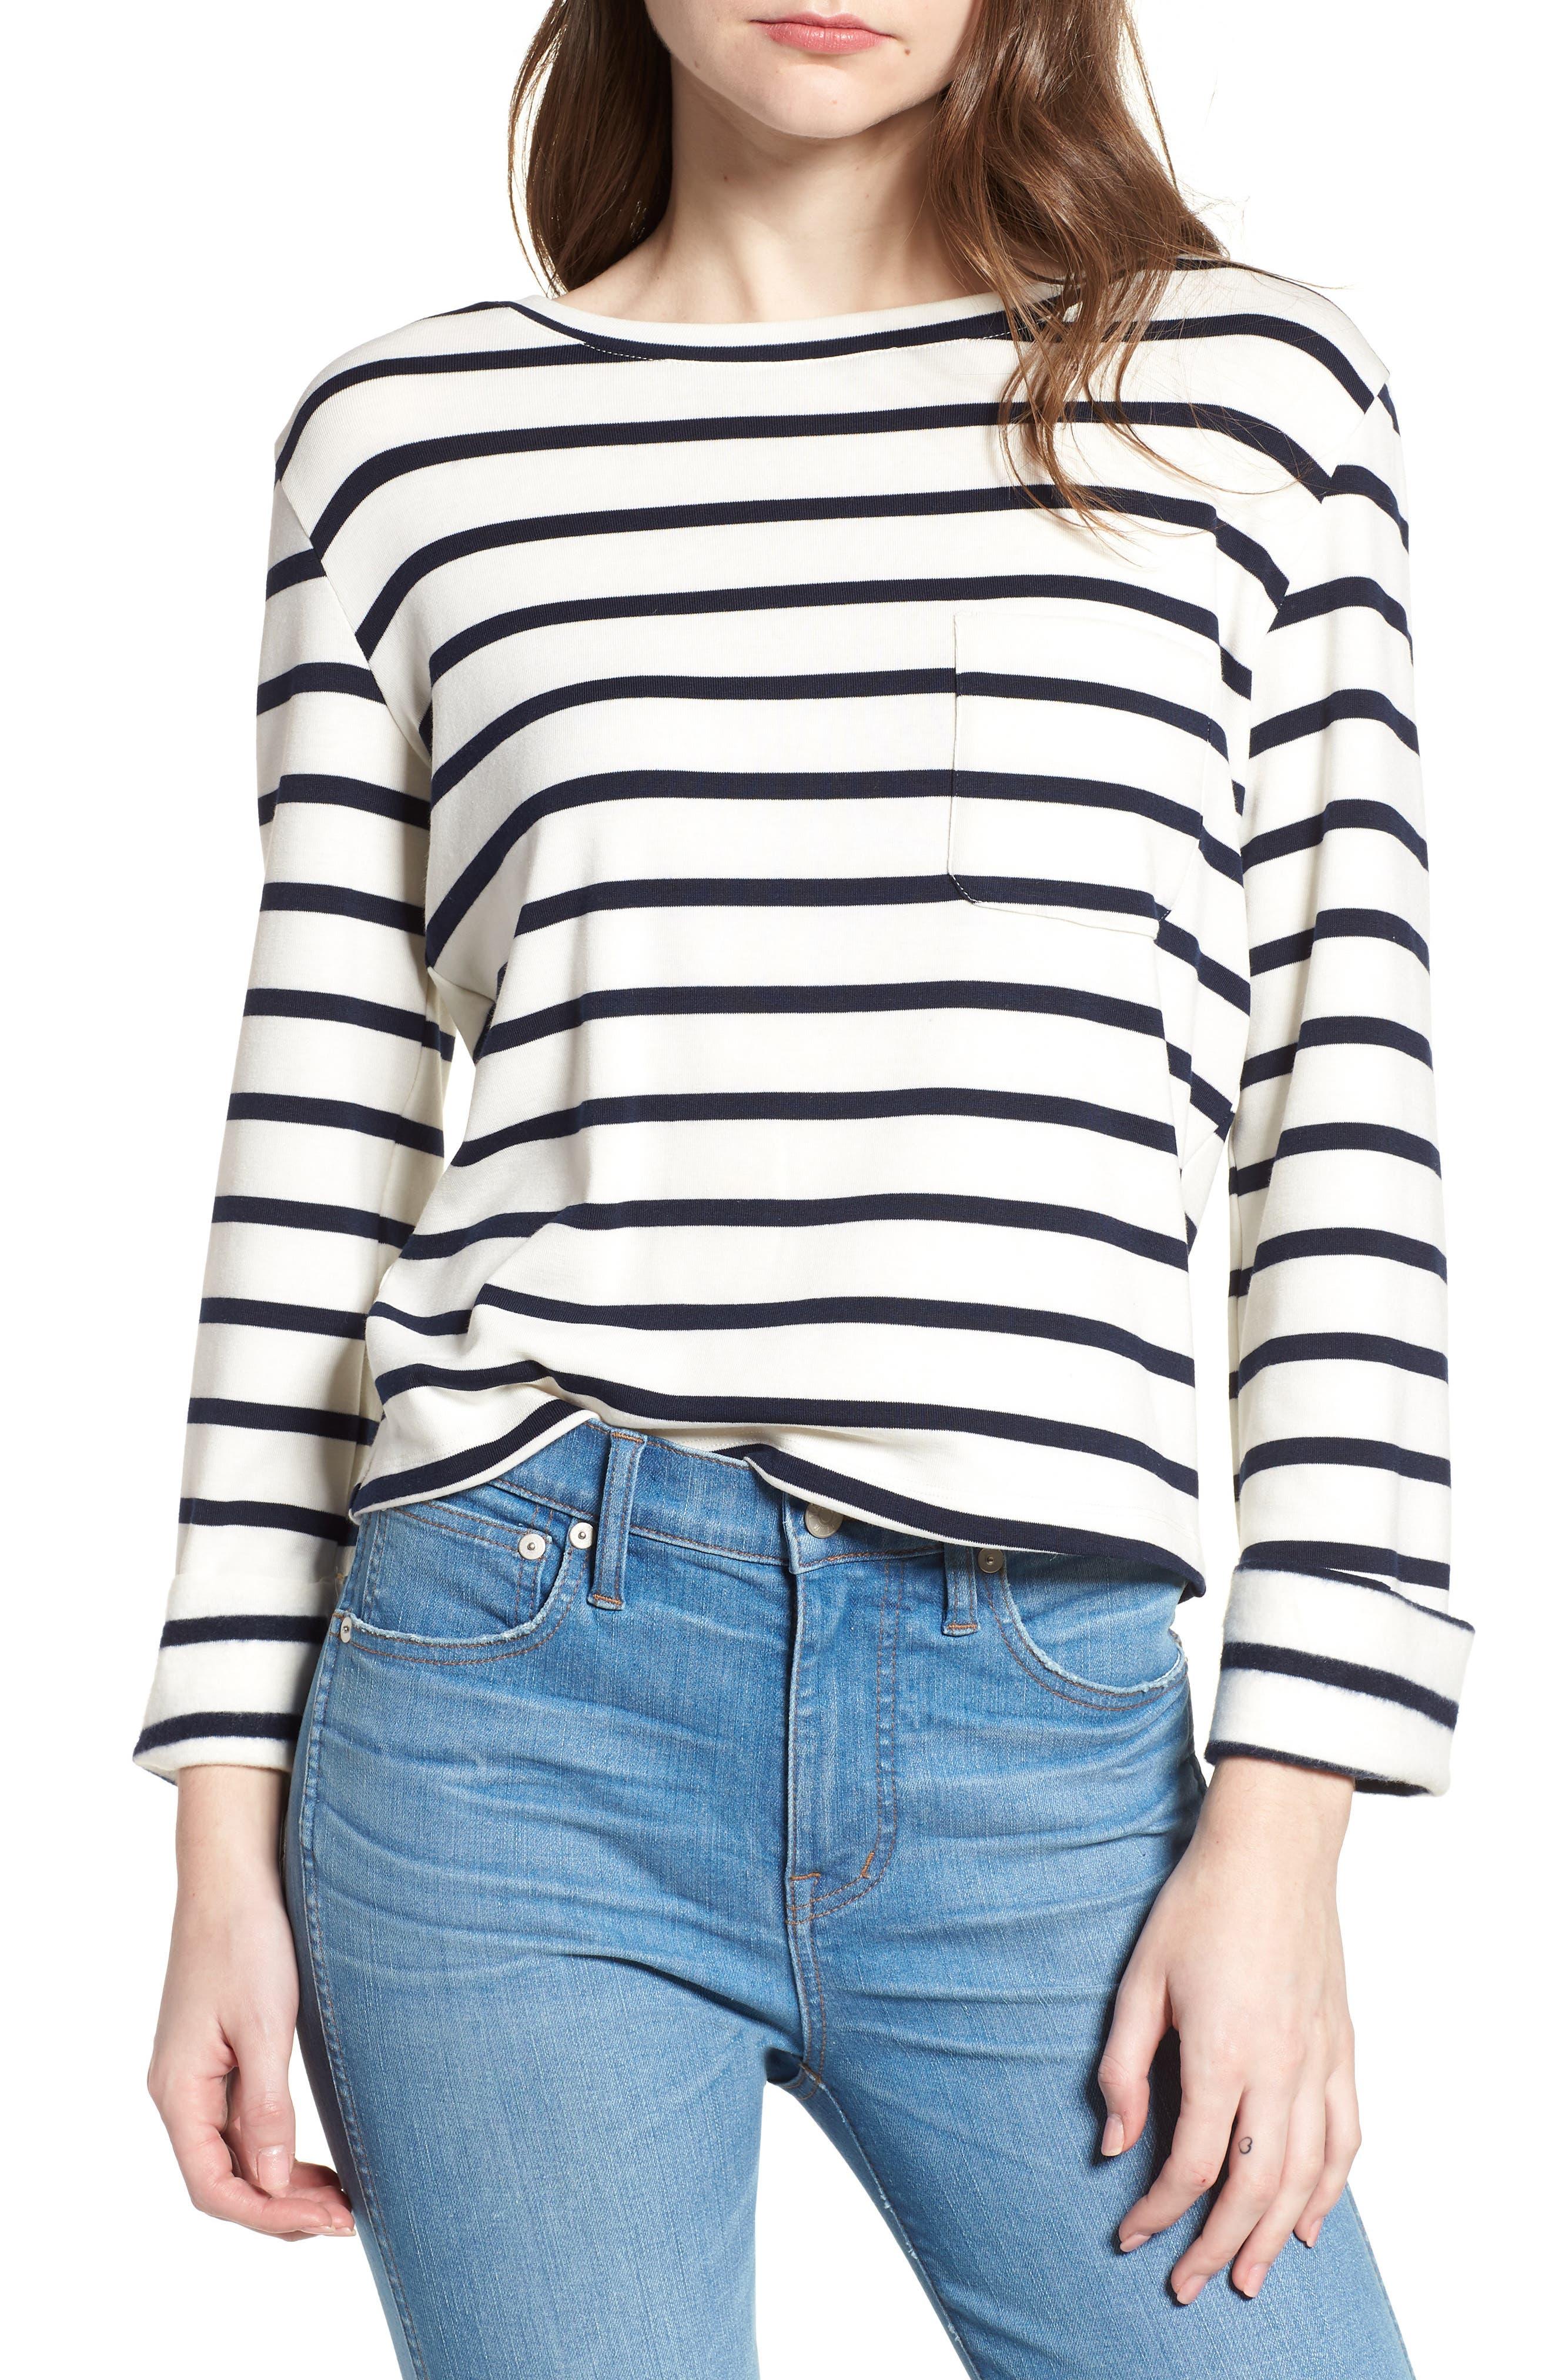 Bishop + Young Stripe Lace-Up Back Top,                         Main,                         color, Black Stripe